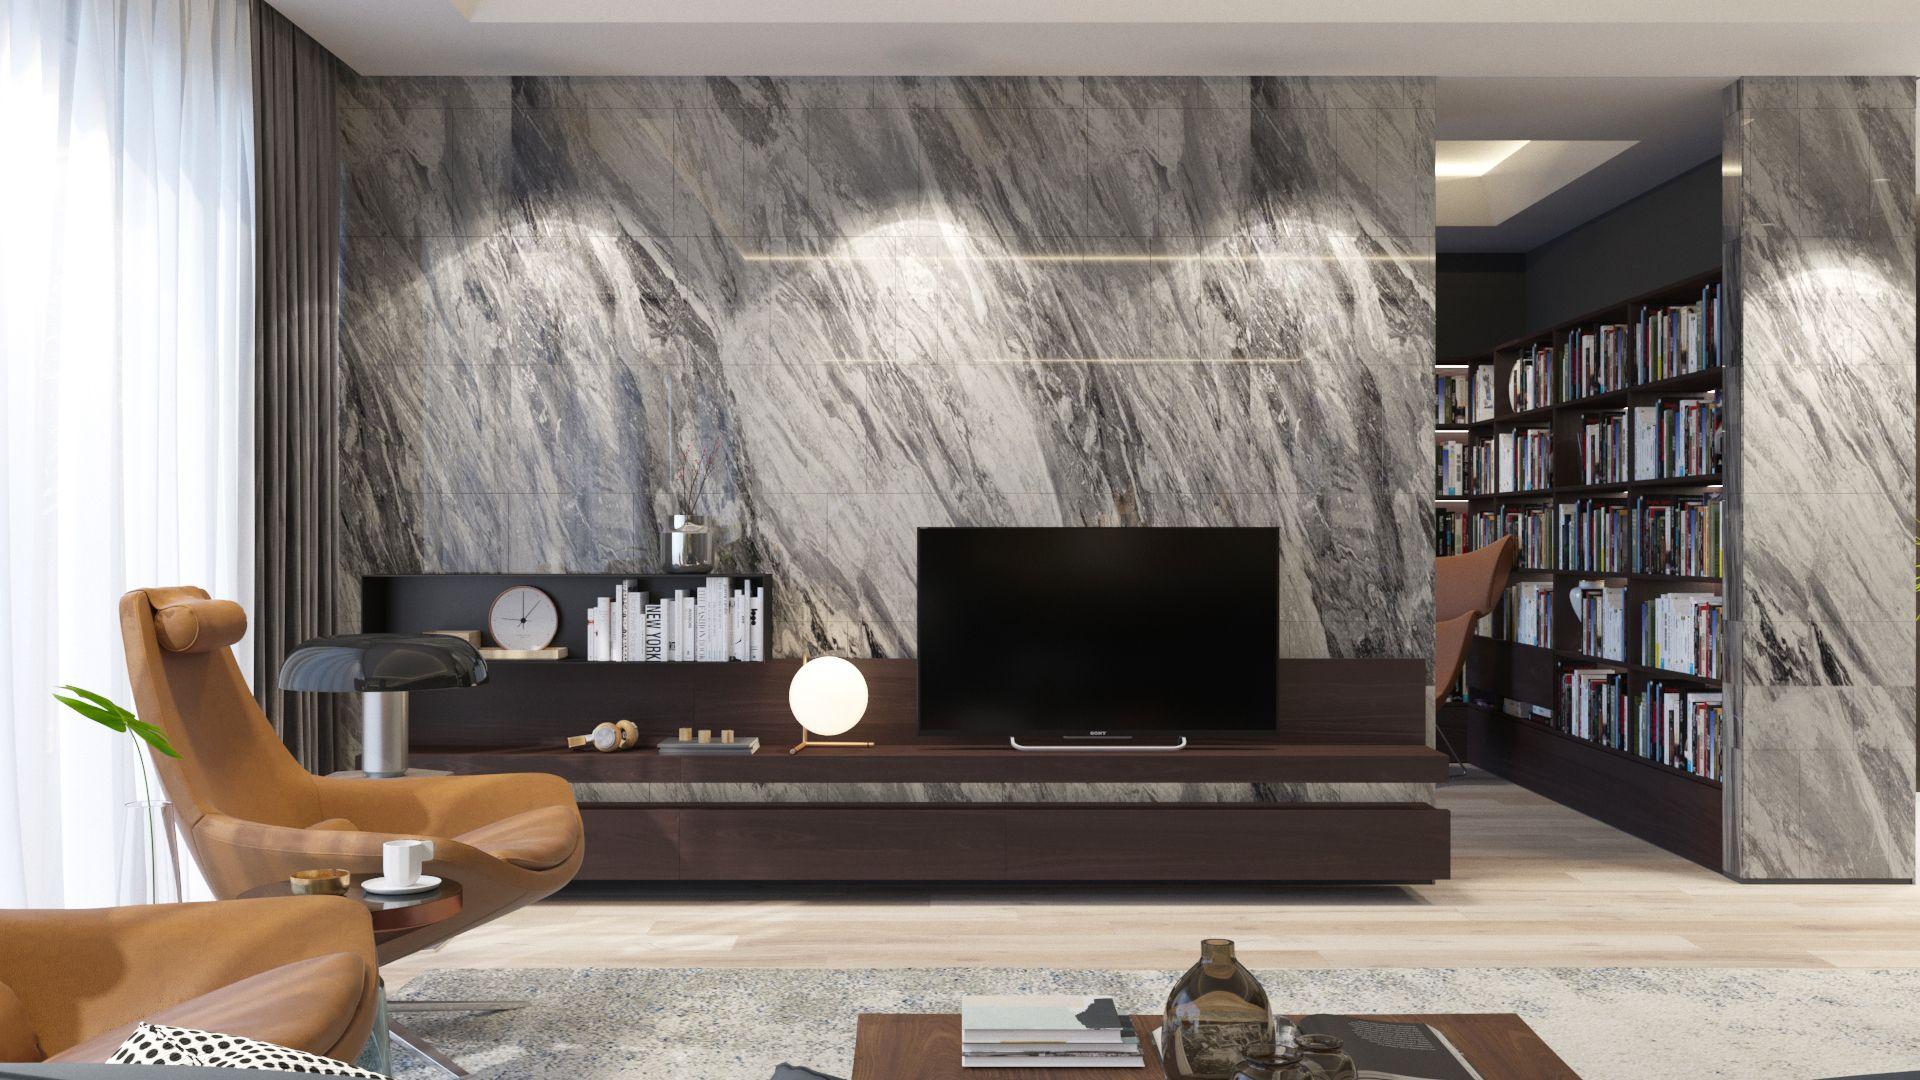 Penthouse In Nairobi On Behance Luxury Living Room Interior